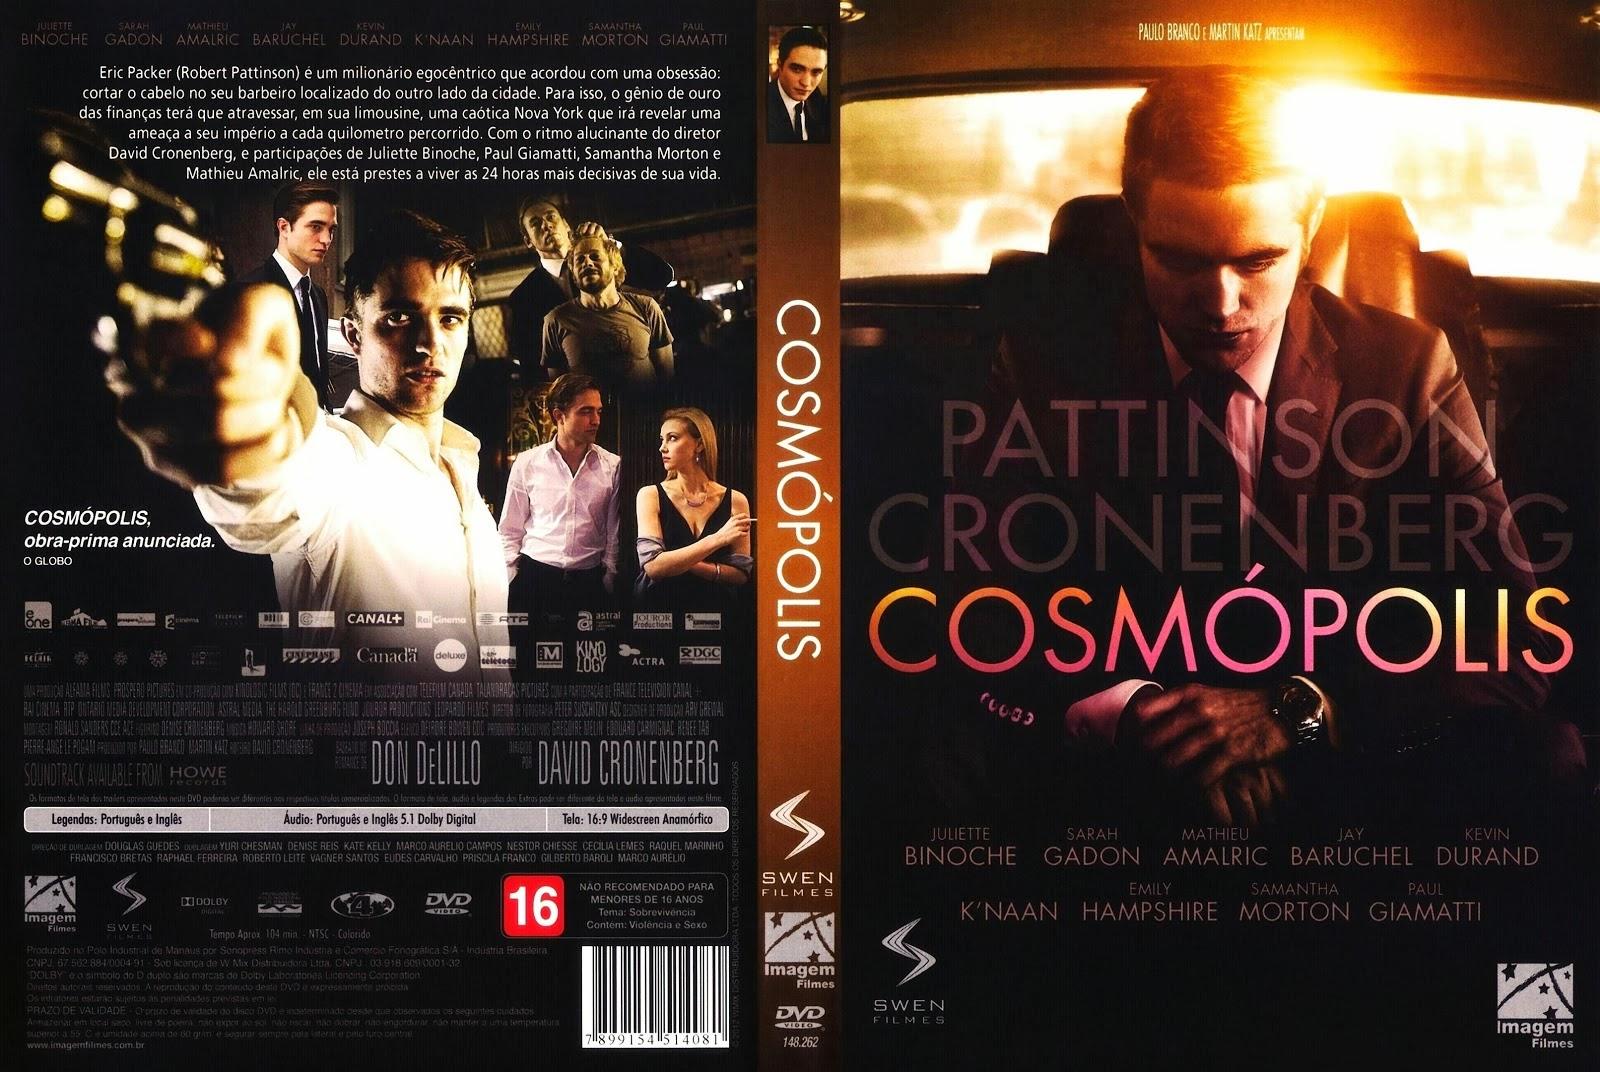 Cosmópolis Filme Stunning capas medina - somente capas de dvd